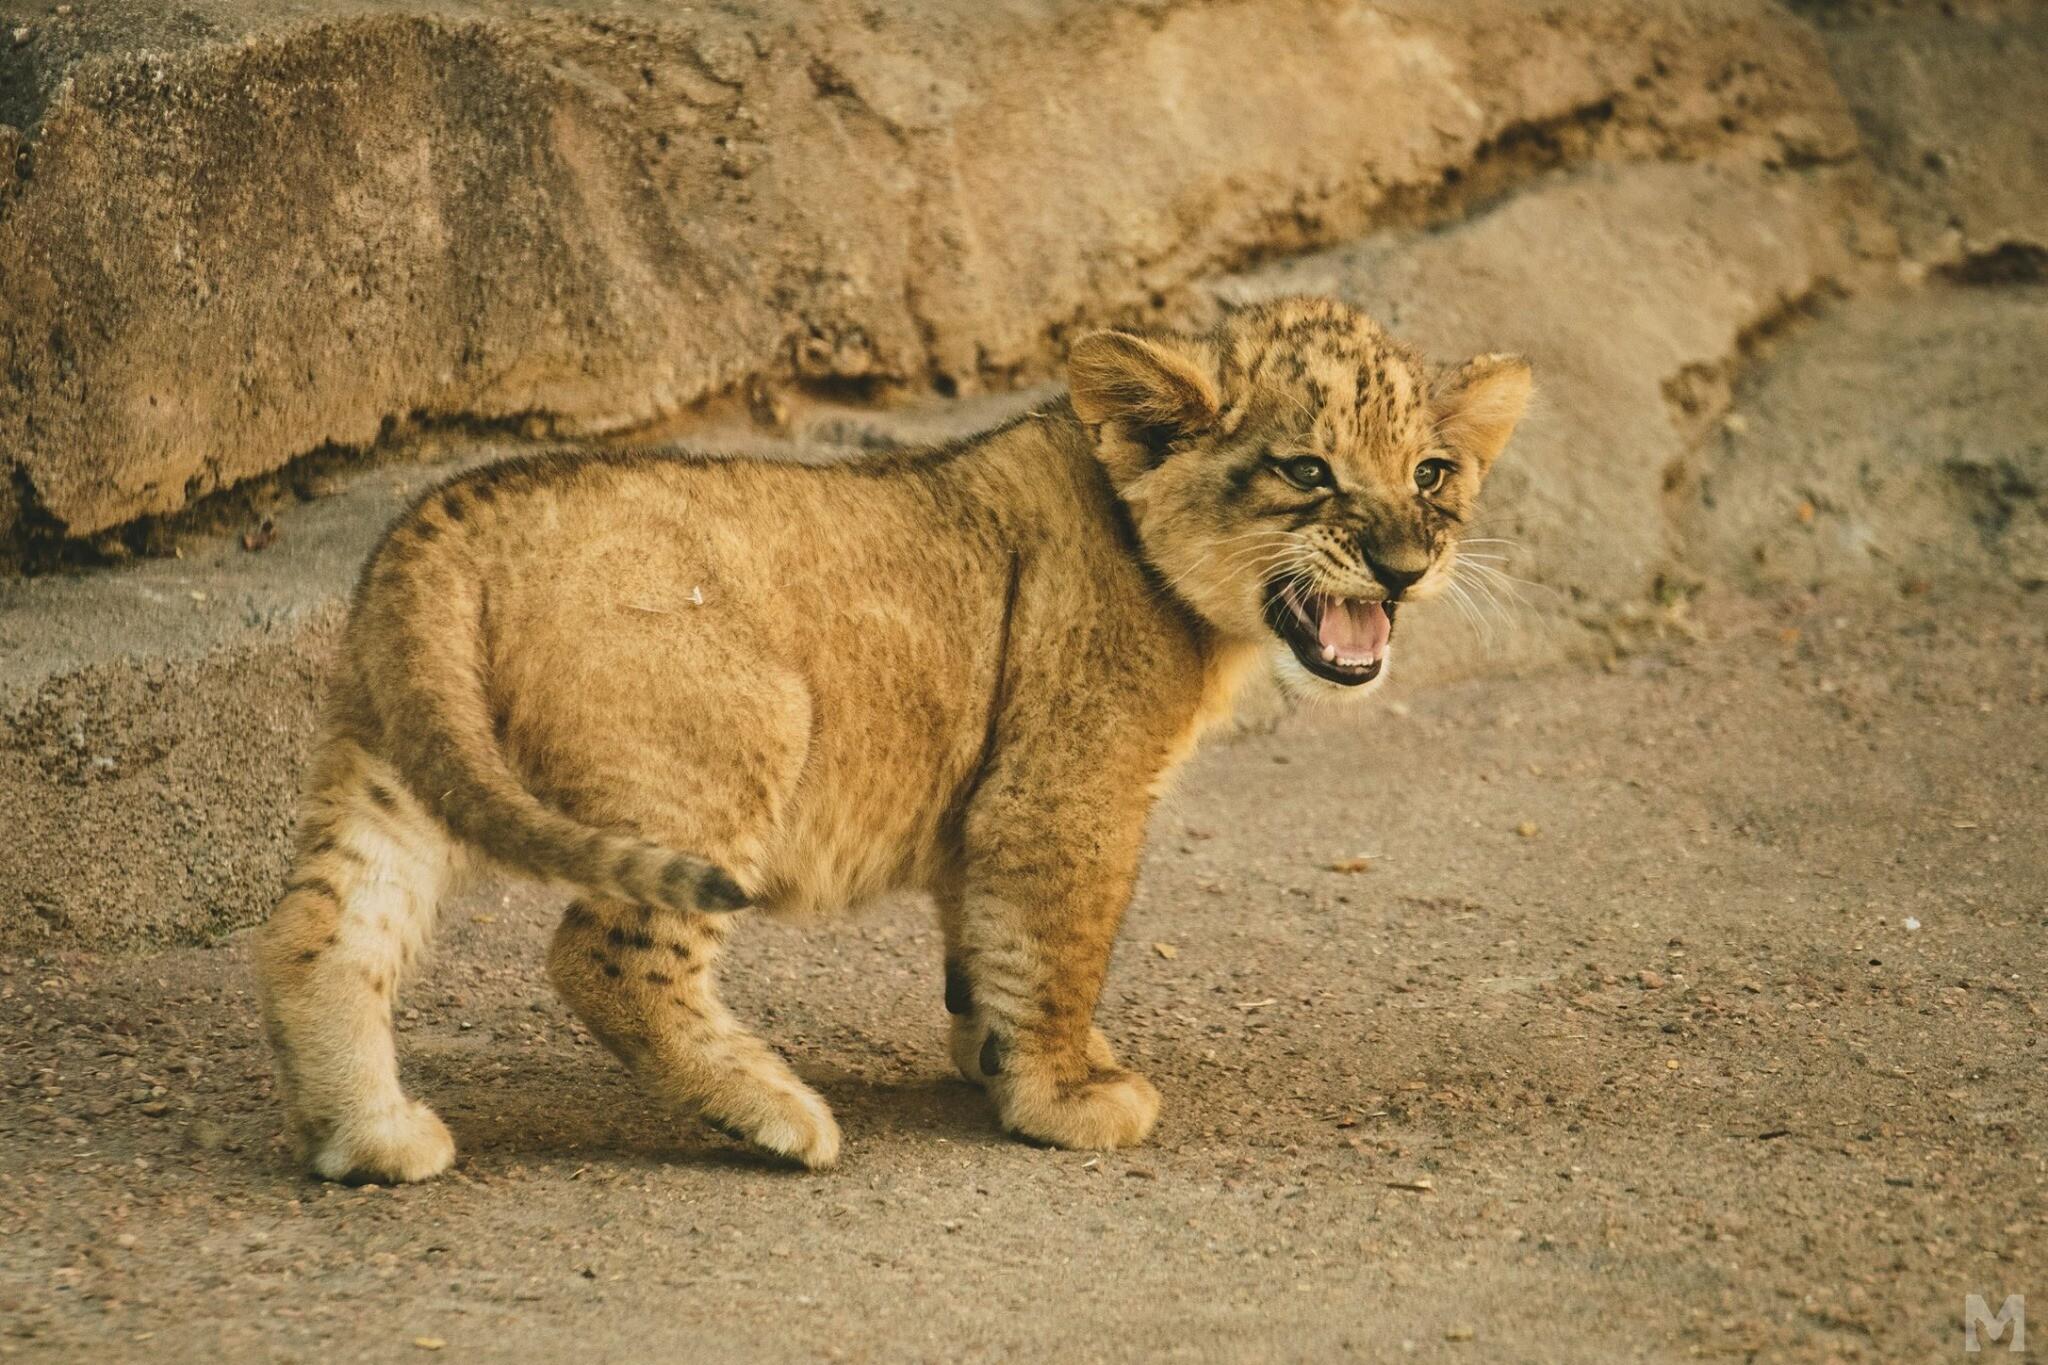 Lion Cub_2_Molly McCormick.jpg